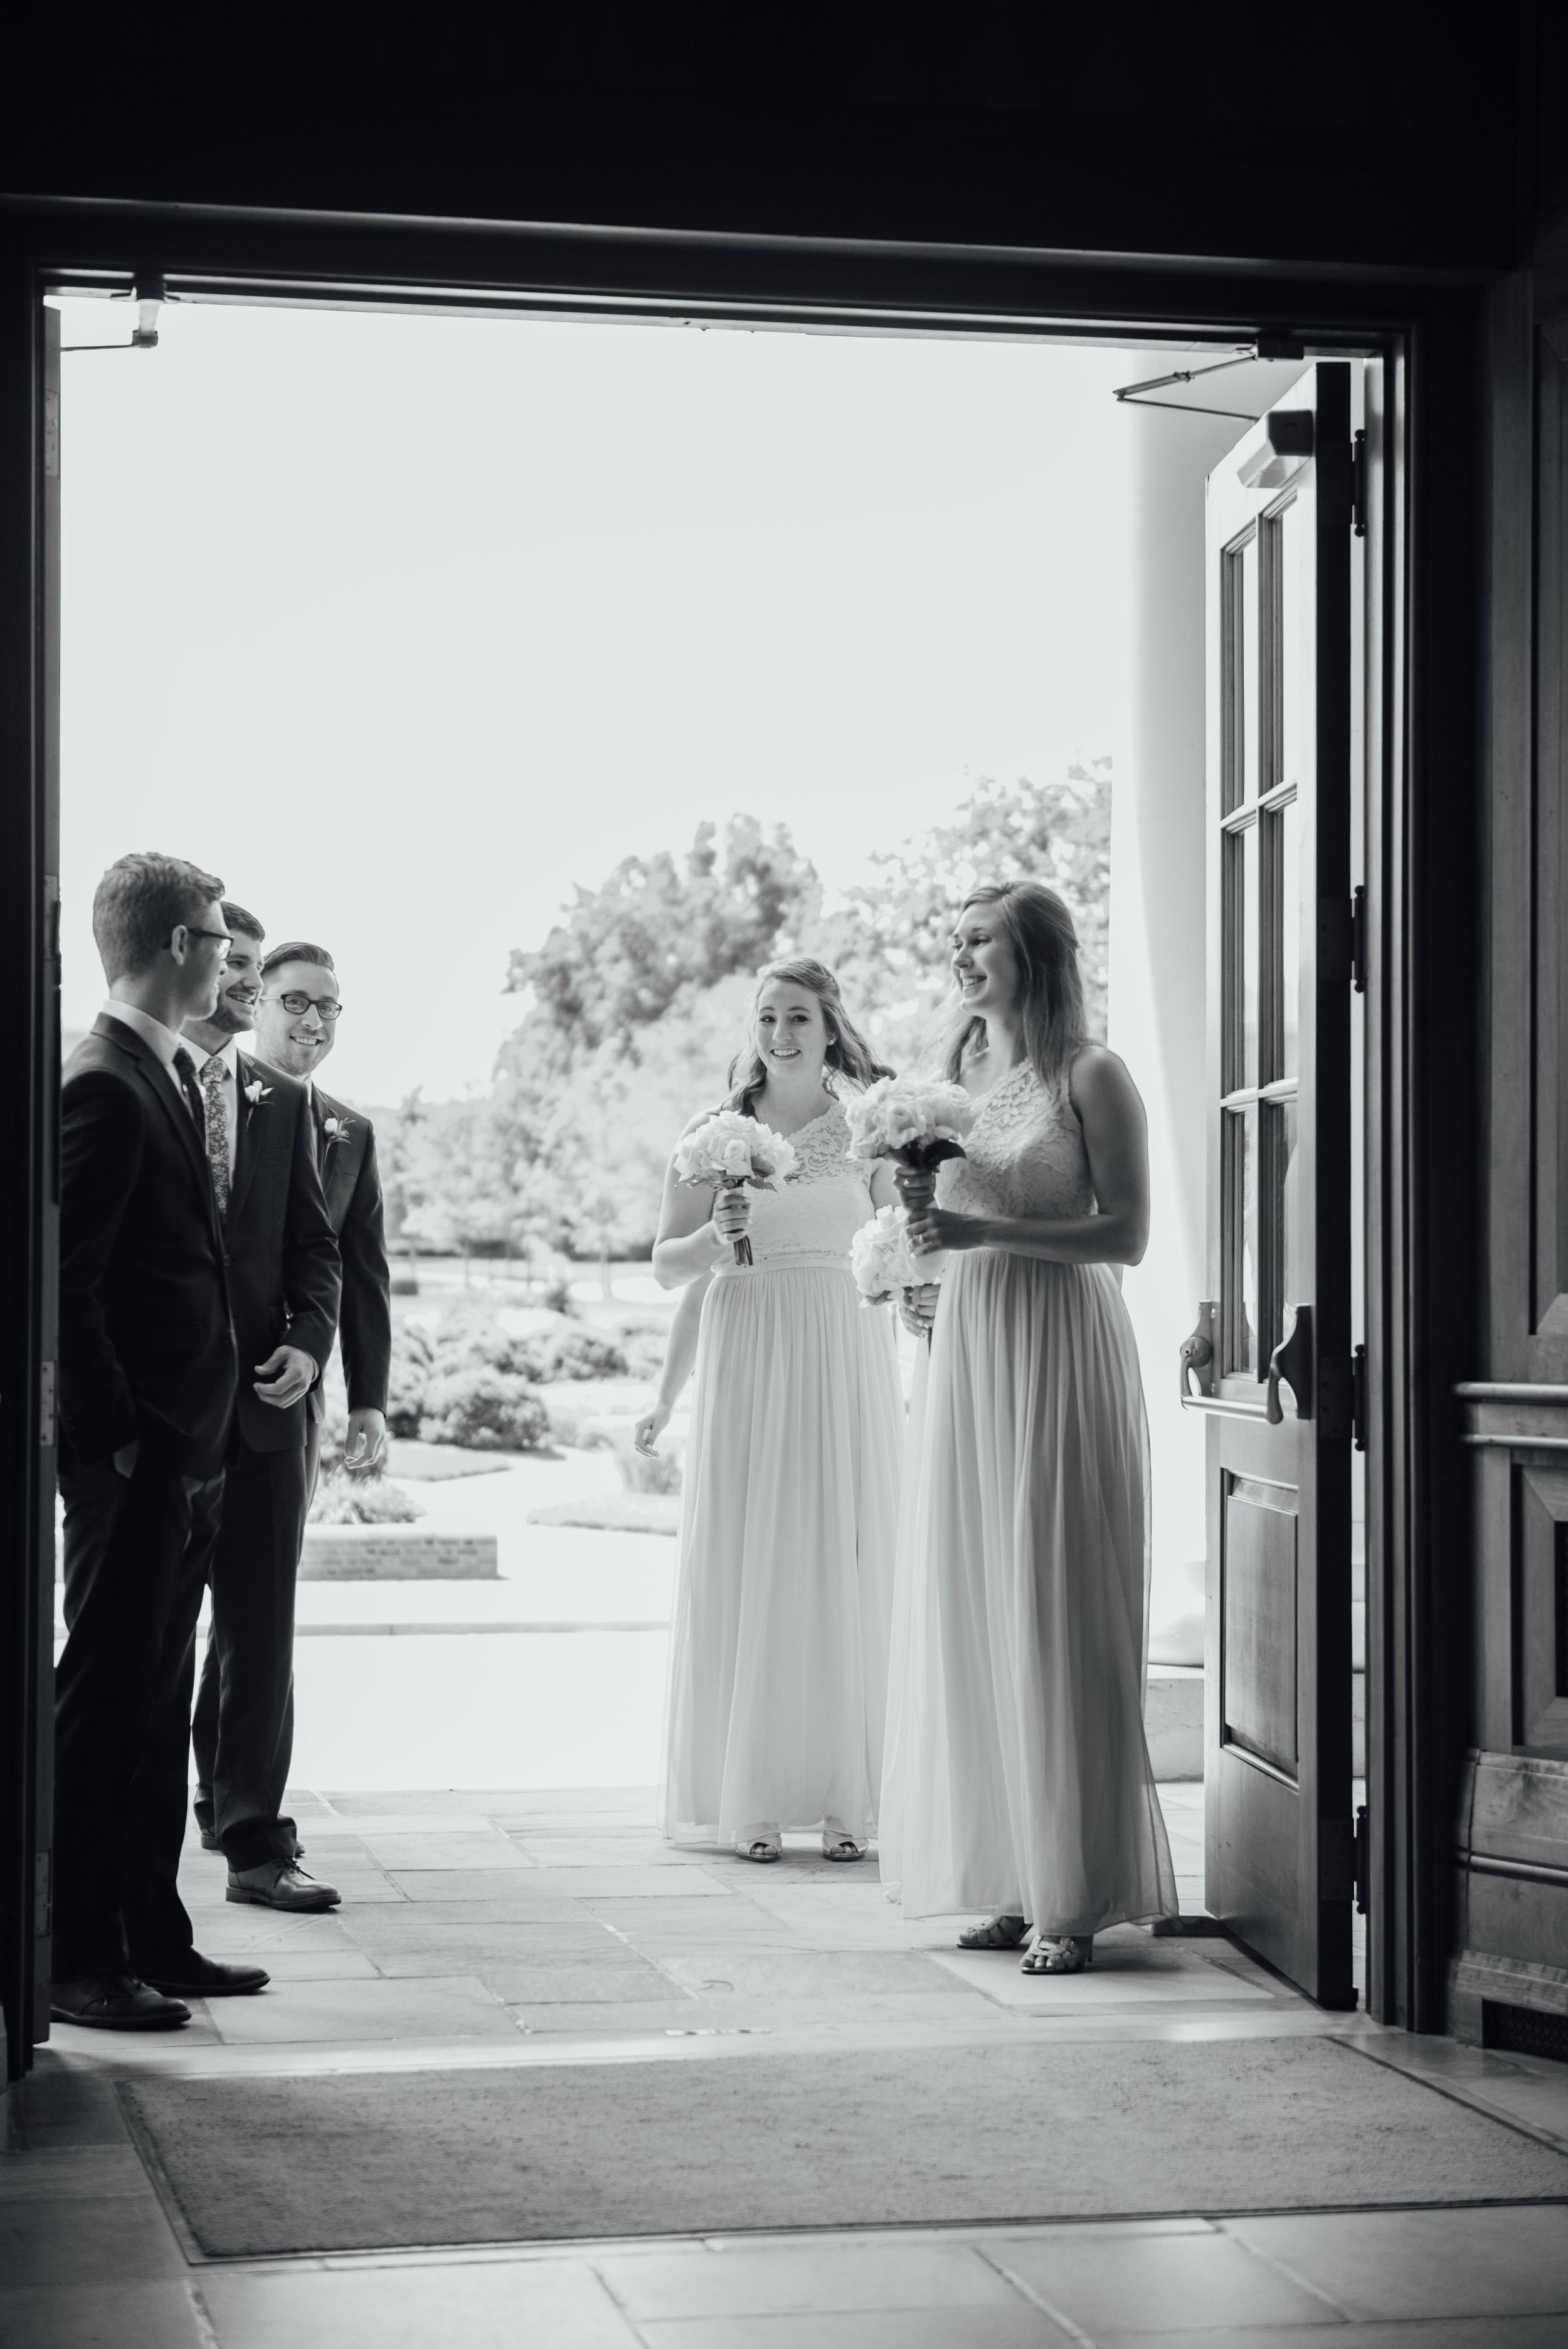 cleland-studios-wedding-photography-35.jpg